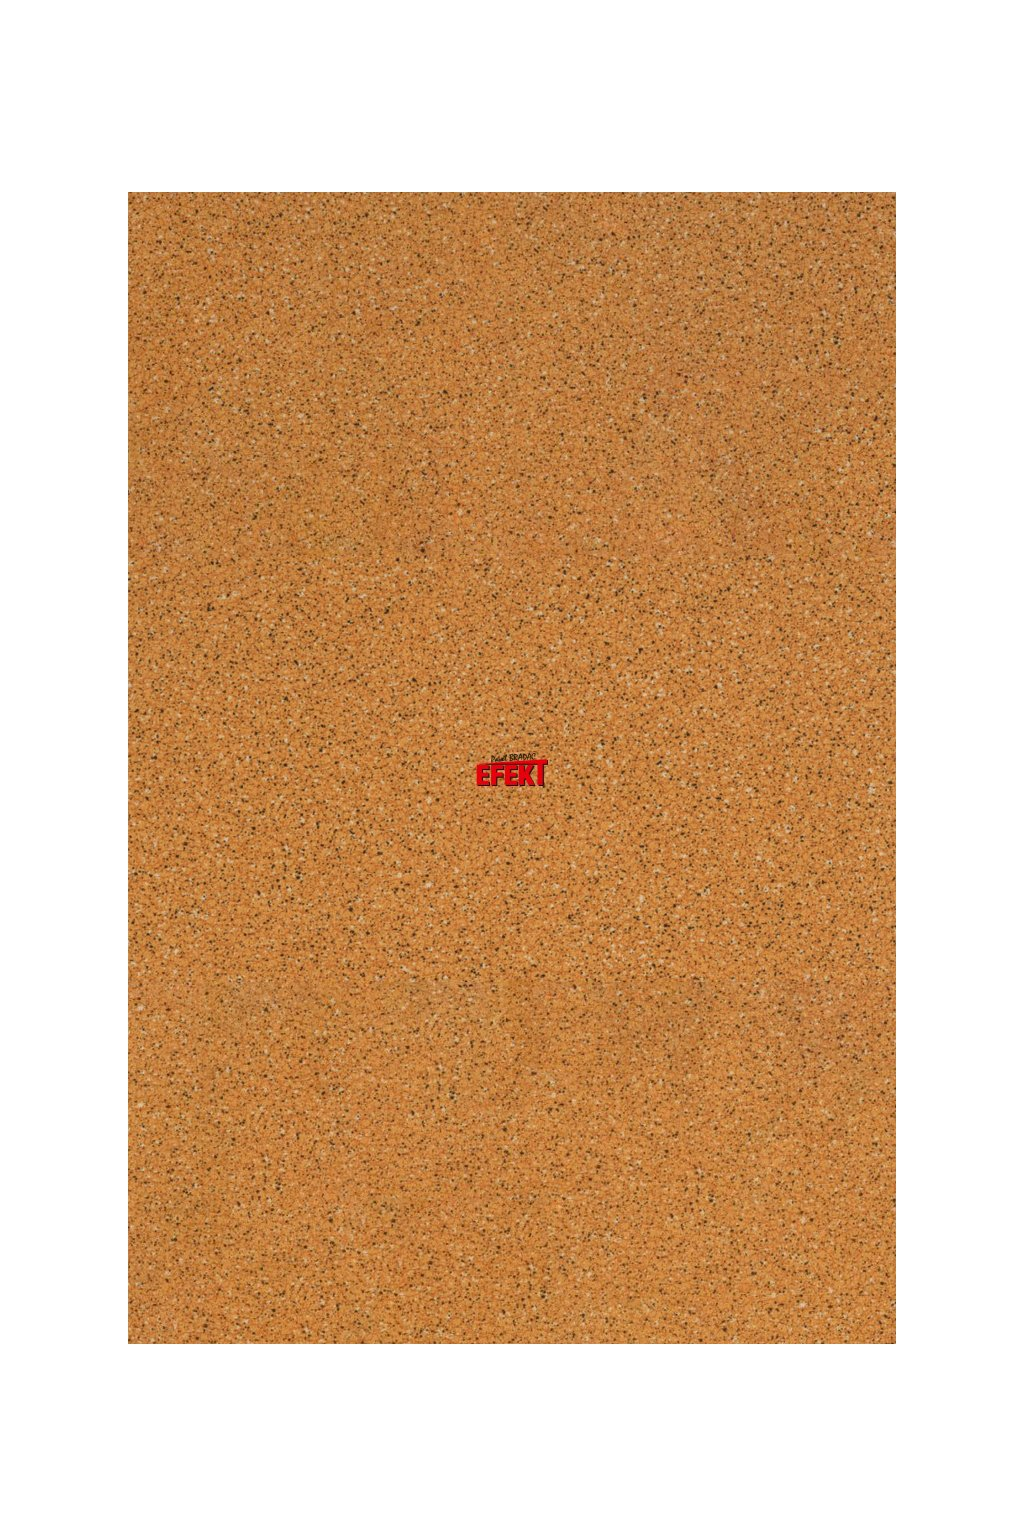 Gerflor Timberline Pixel Paprika 178